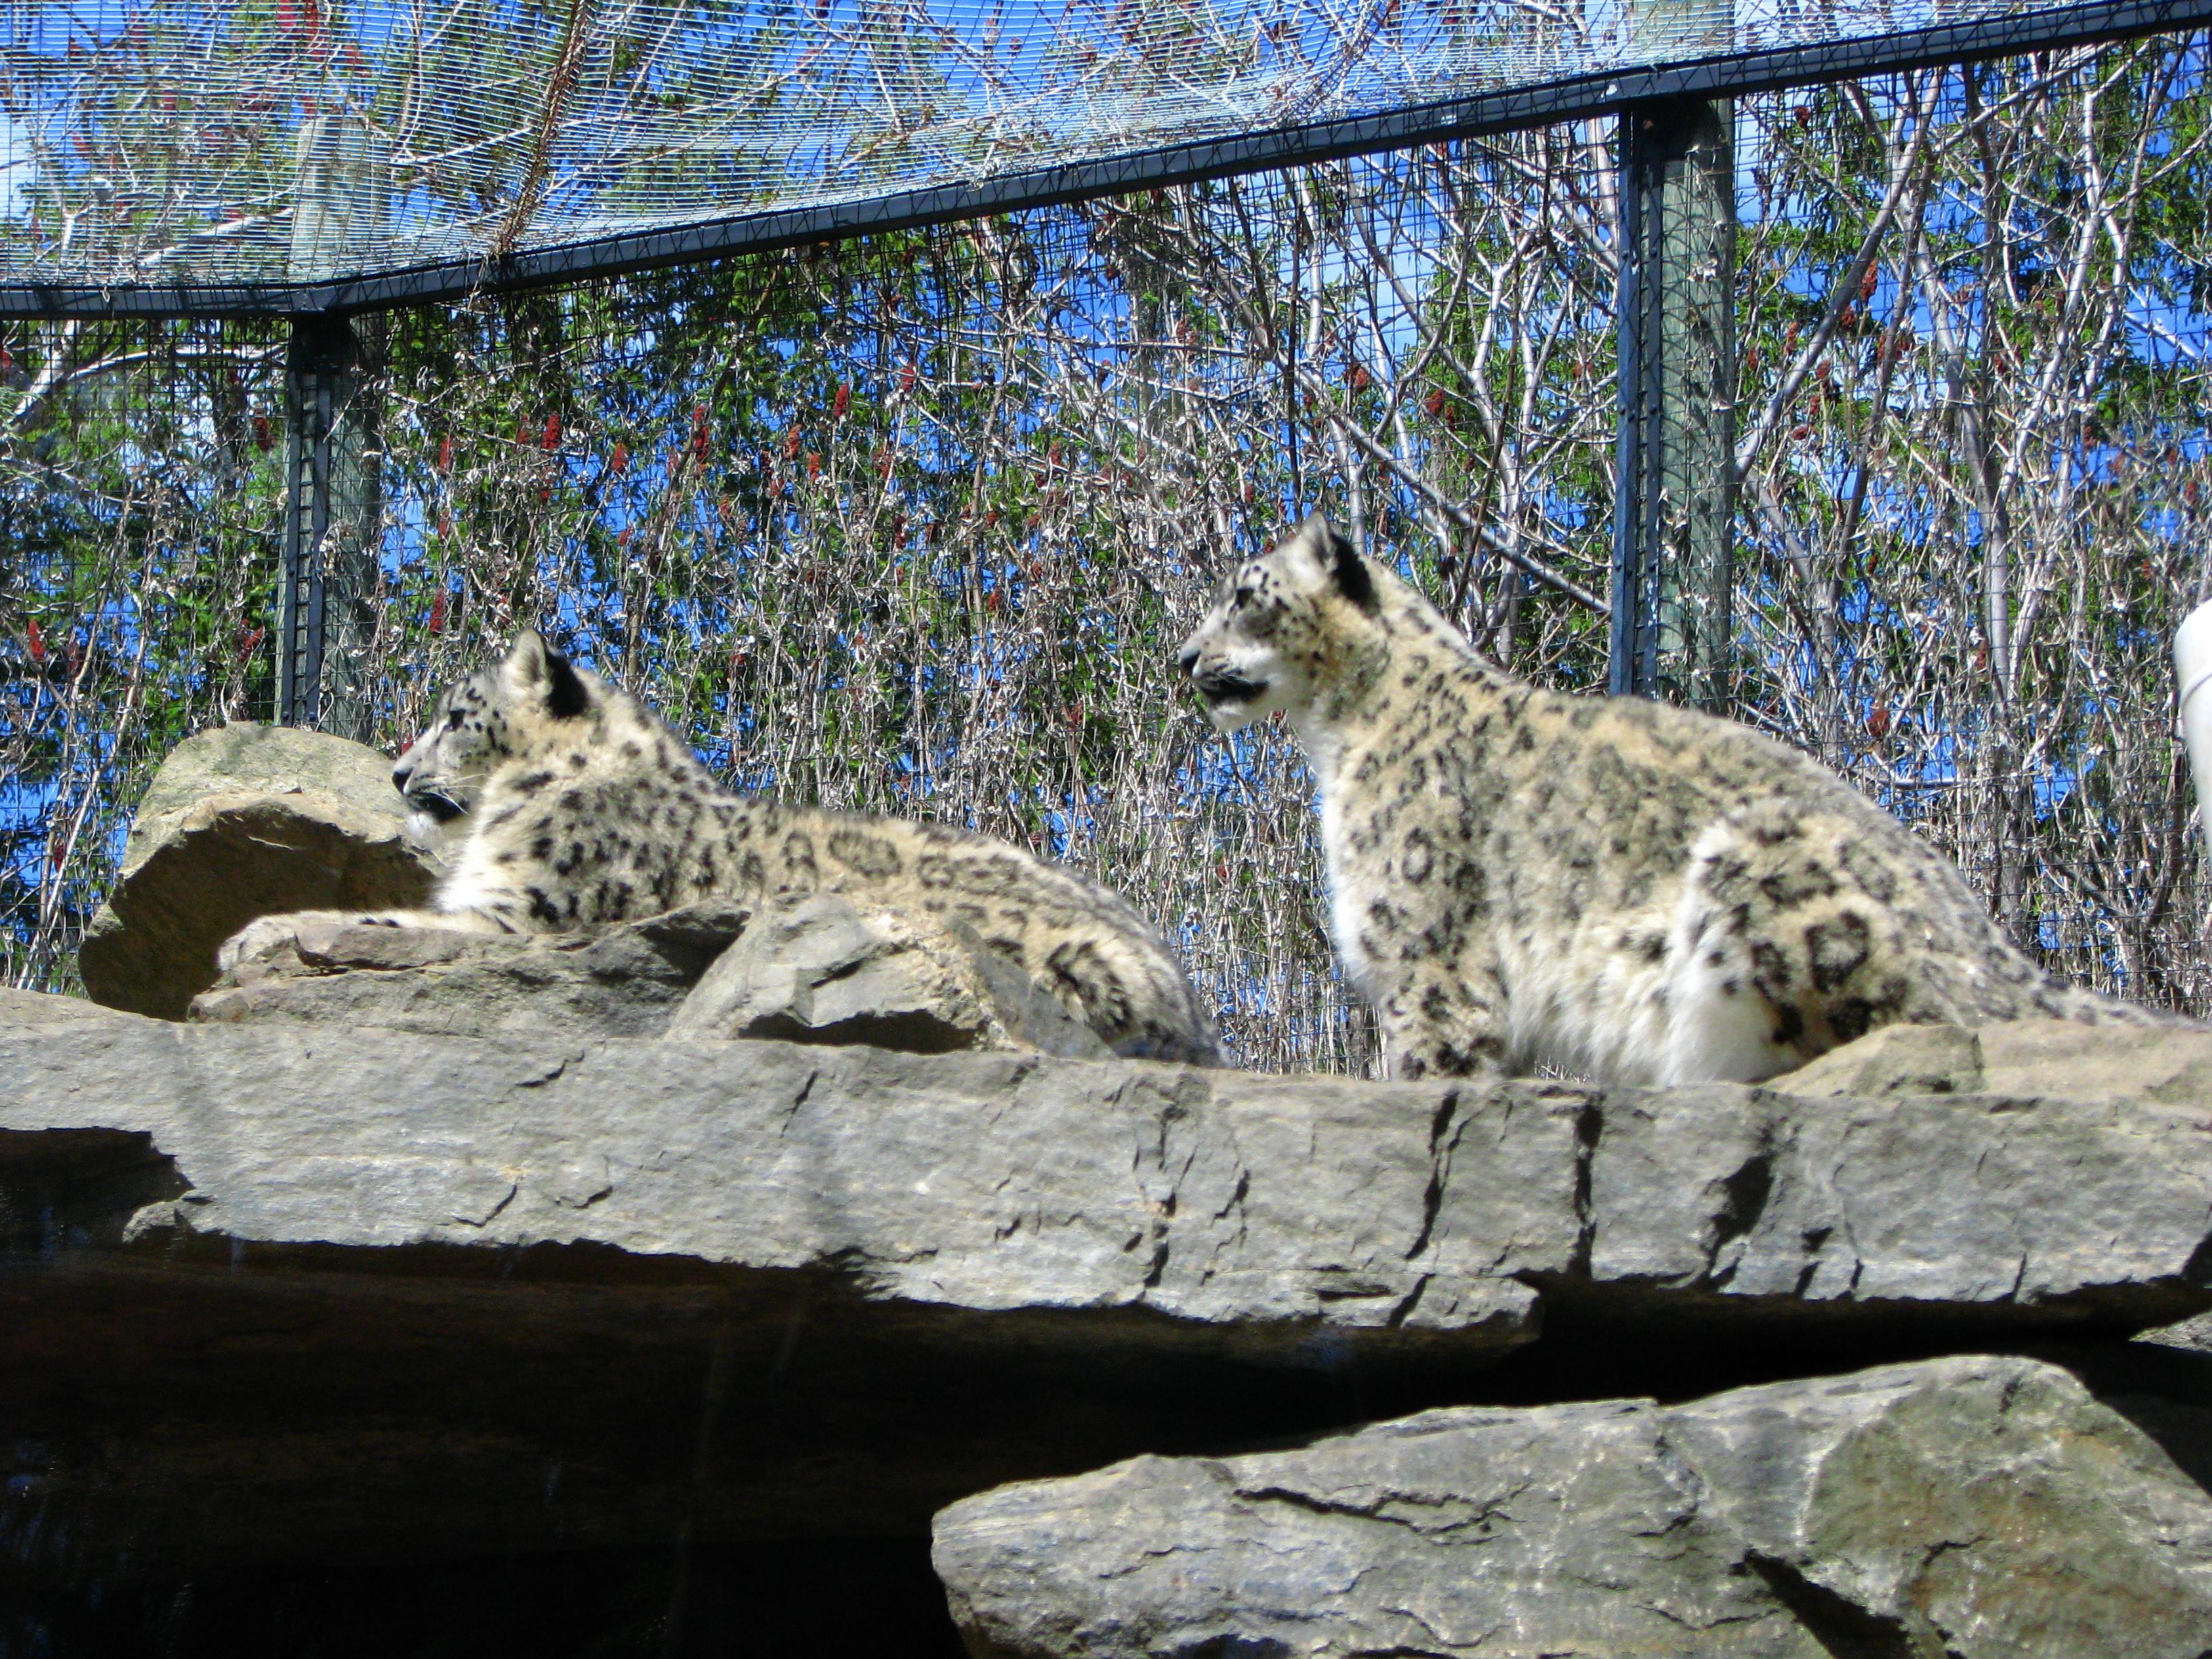 the snow leopard summary